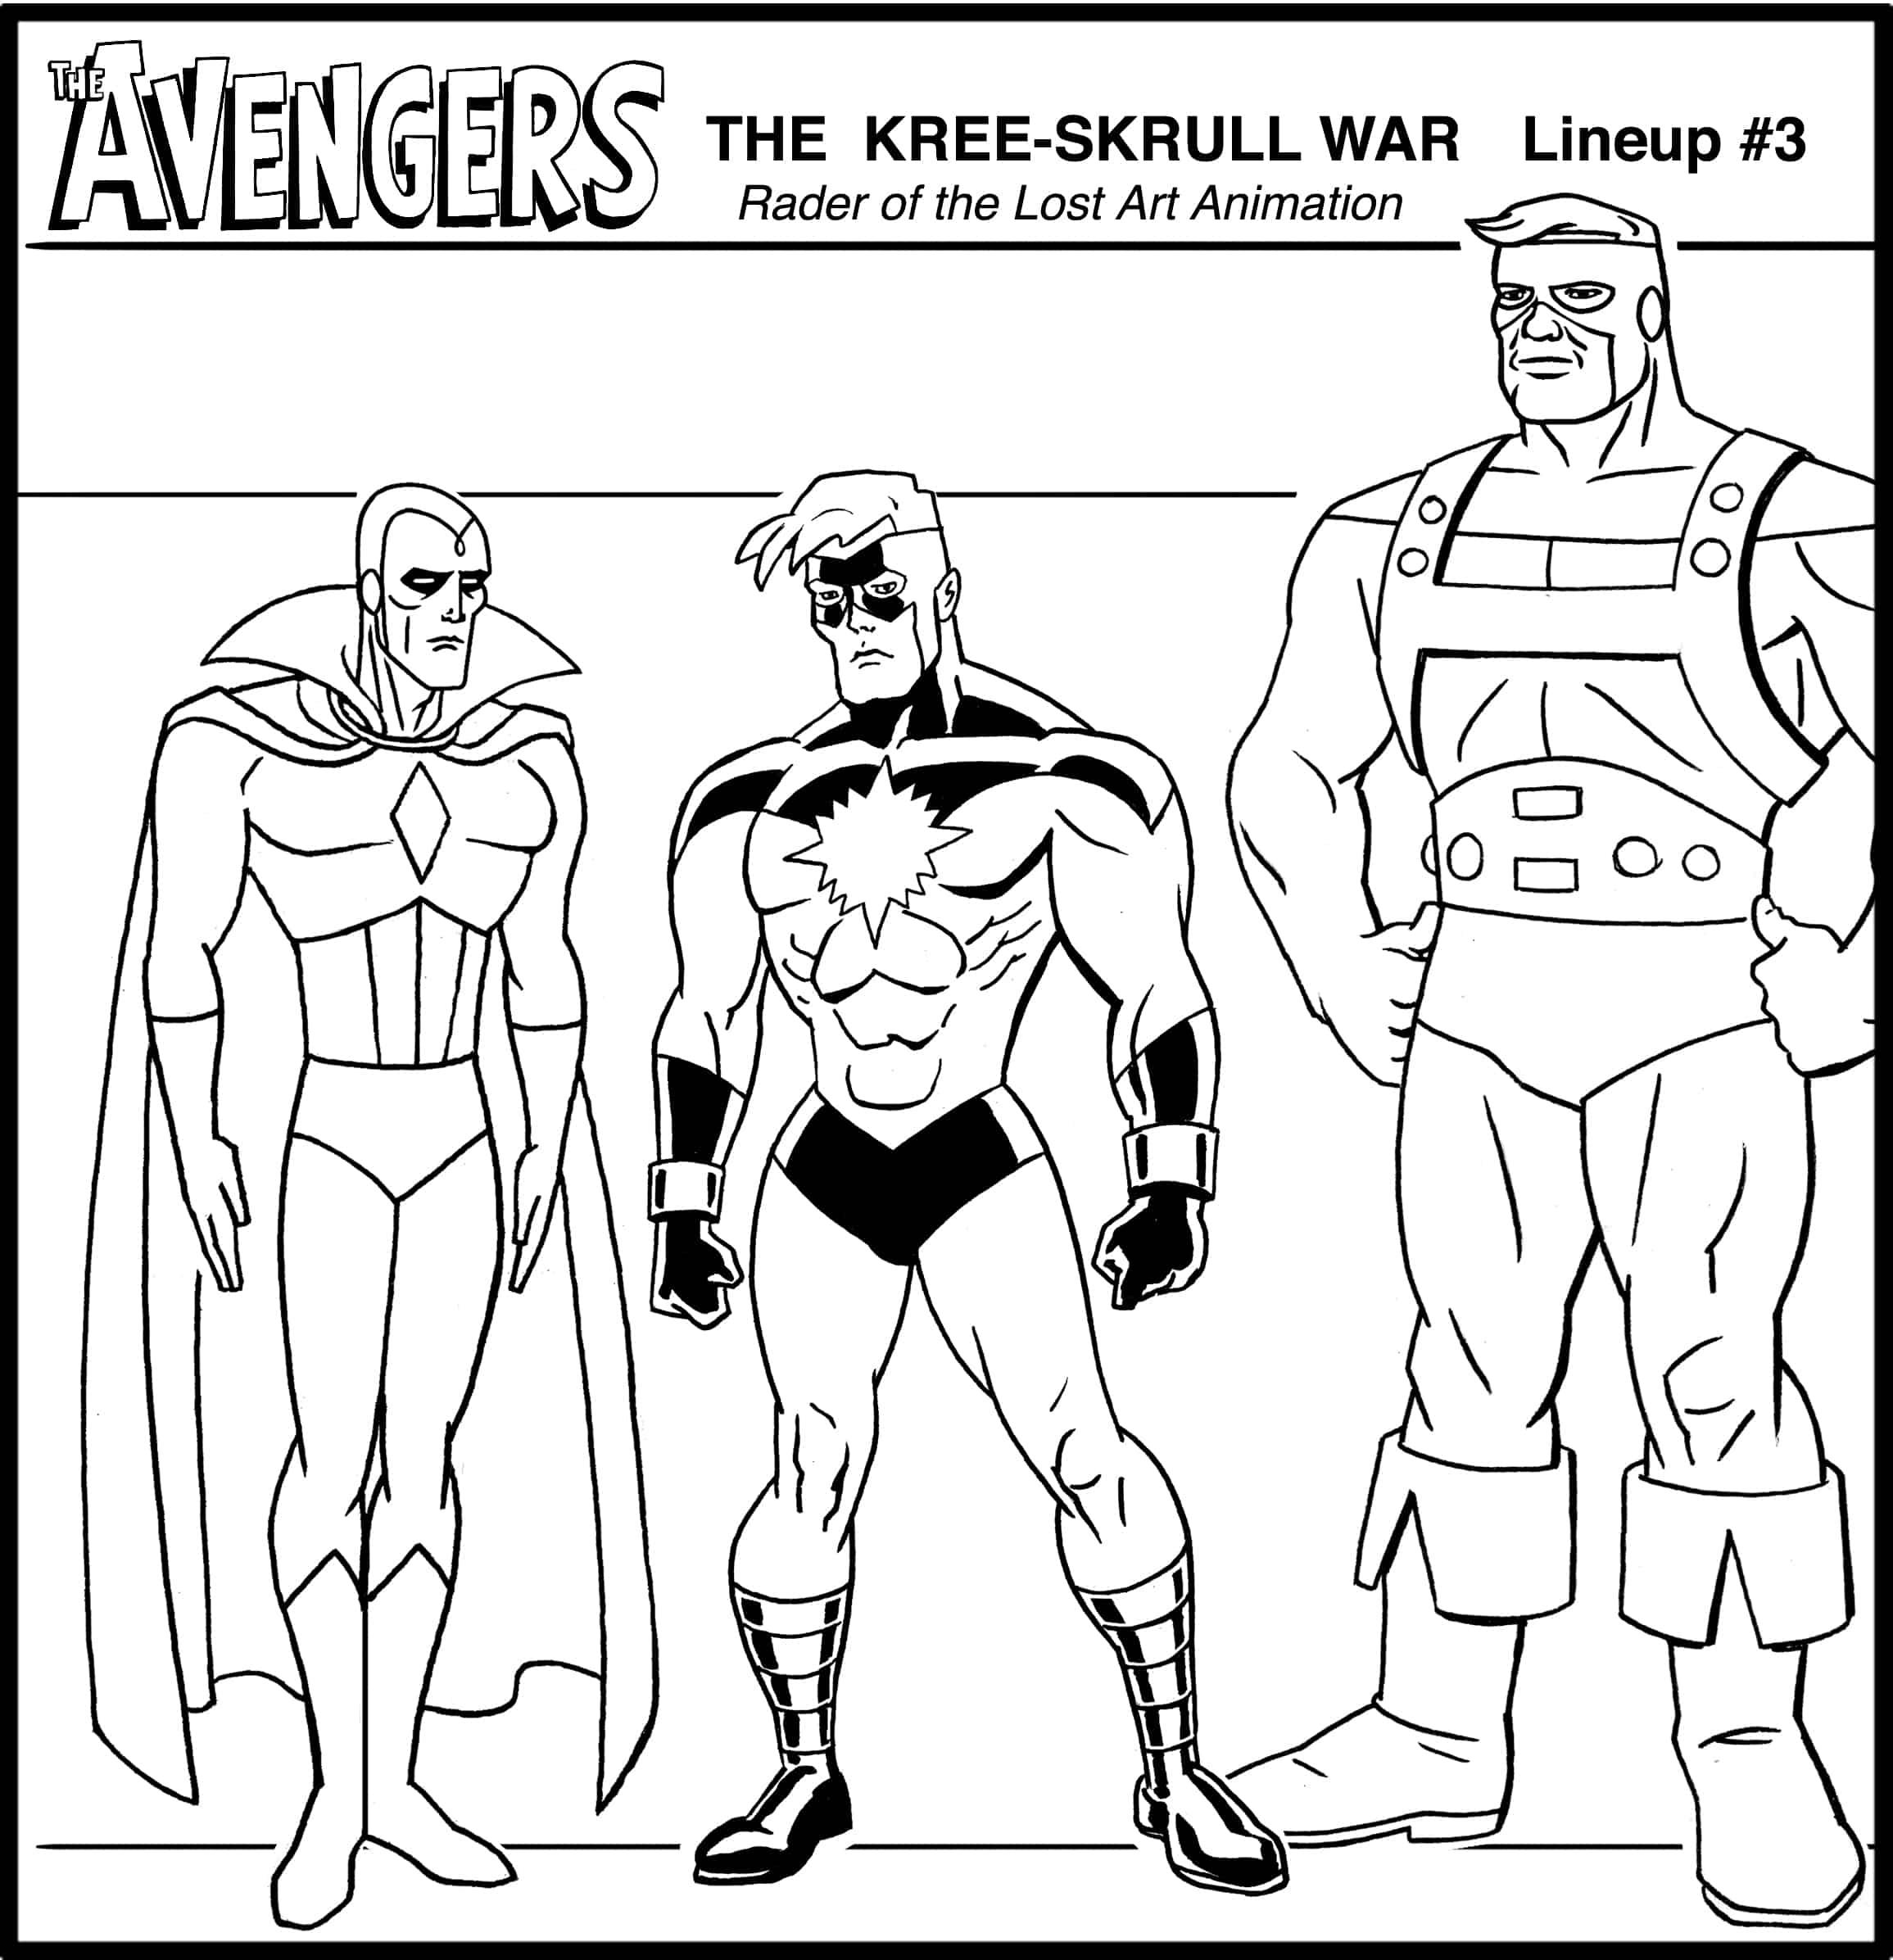 Avengers_Lineup_3